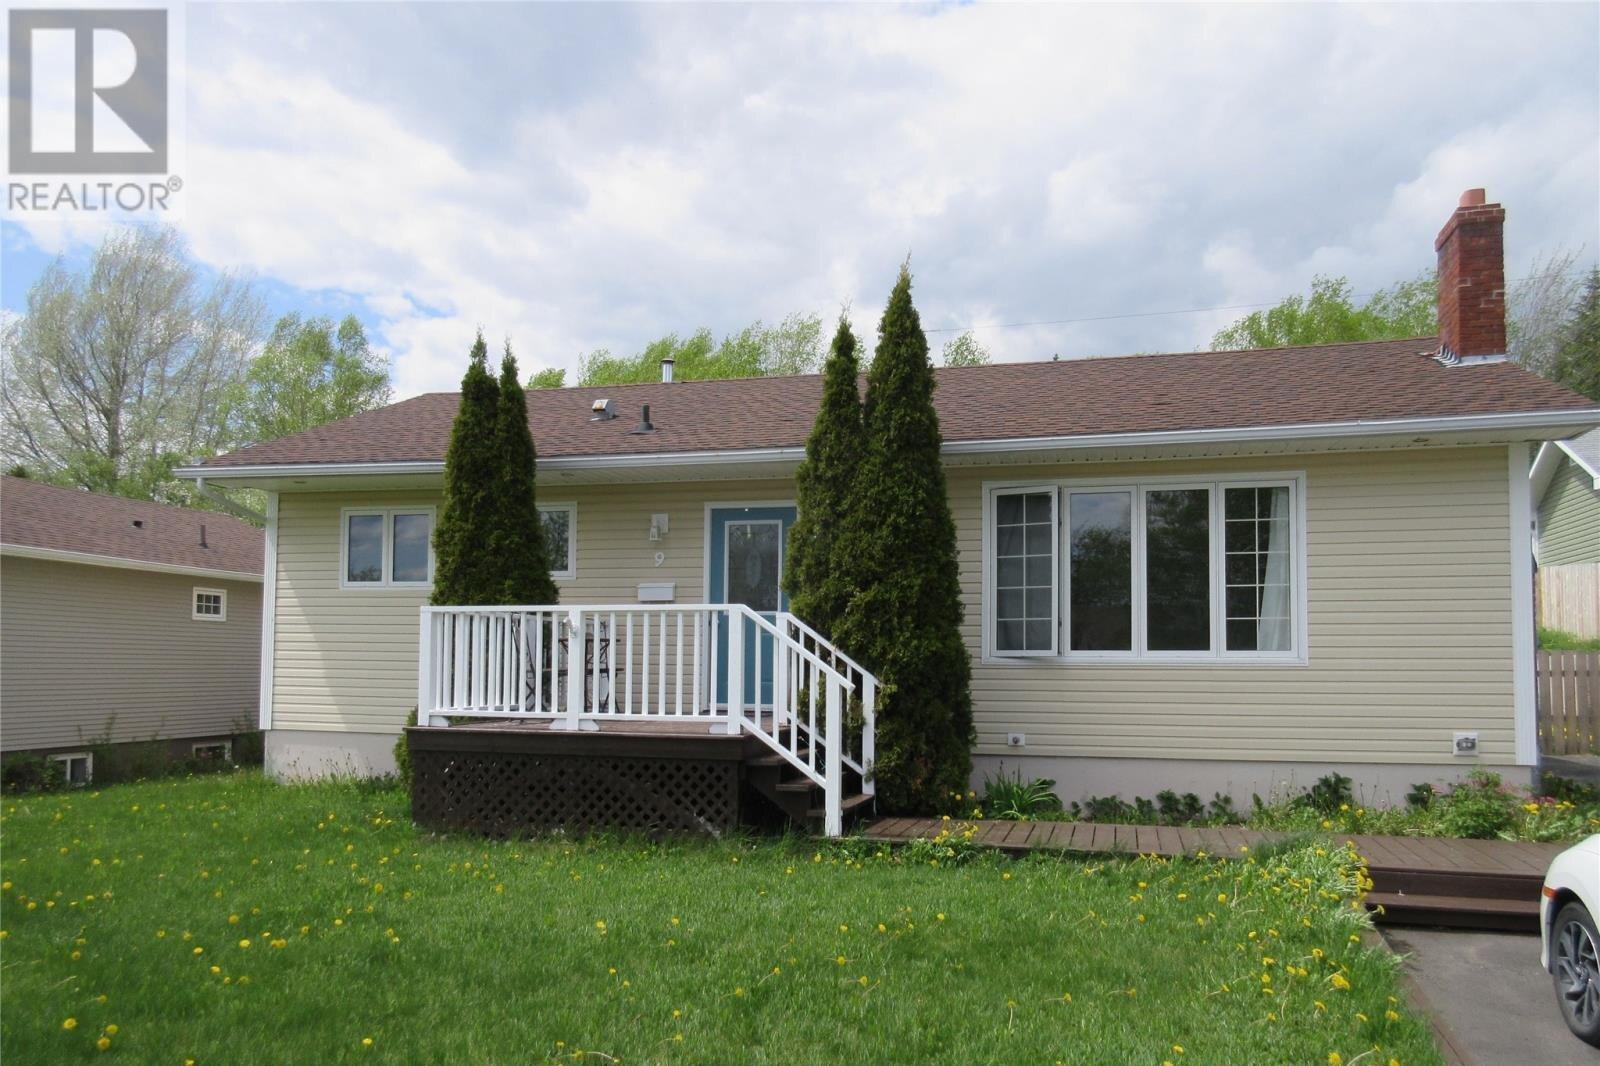 House for sale at 9 Chamberlain St Grand Falls-windsor Newfoundland - MLS: 1213531